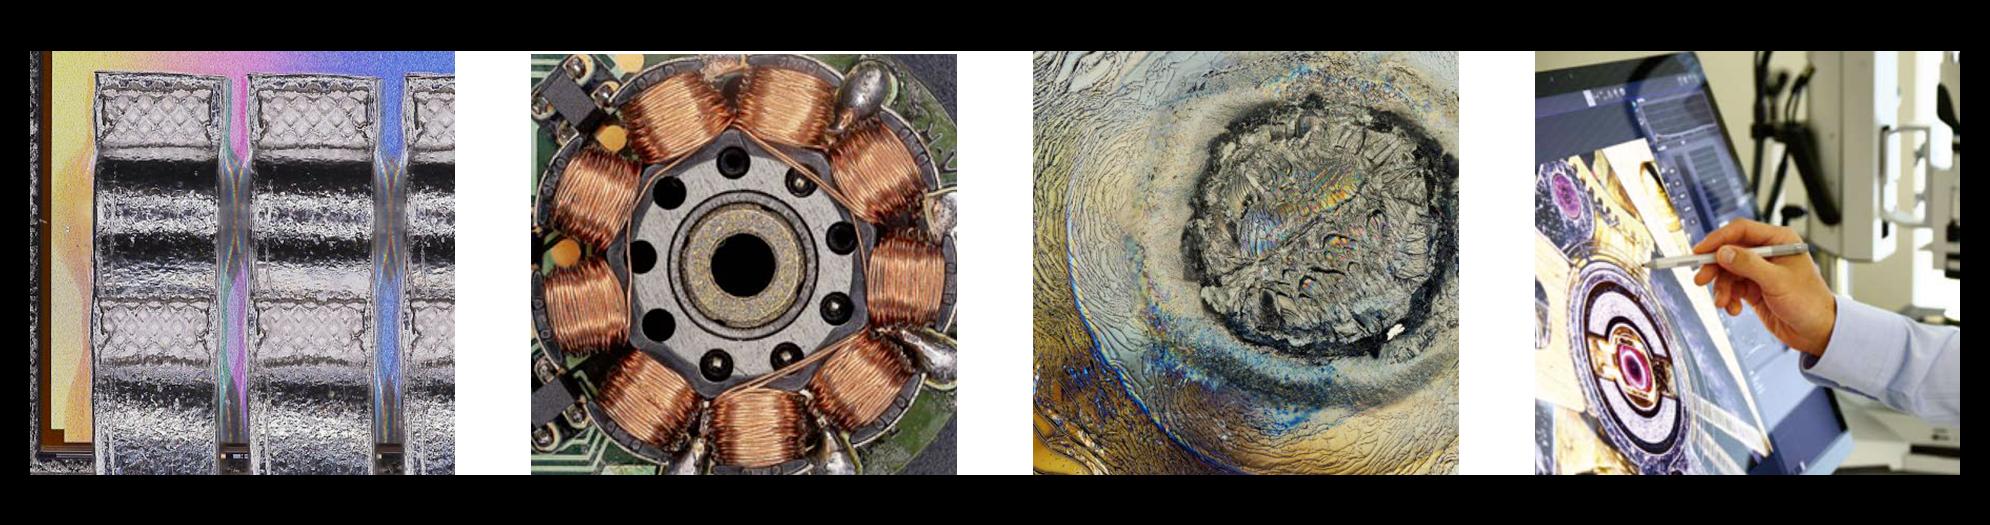 Microscope numérique Hirox HRX-01